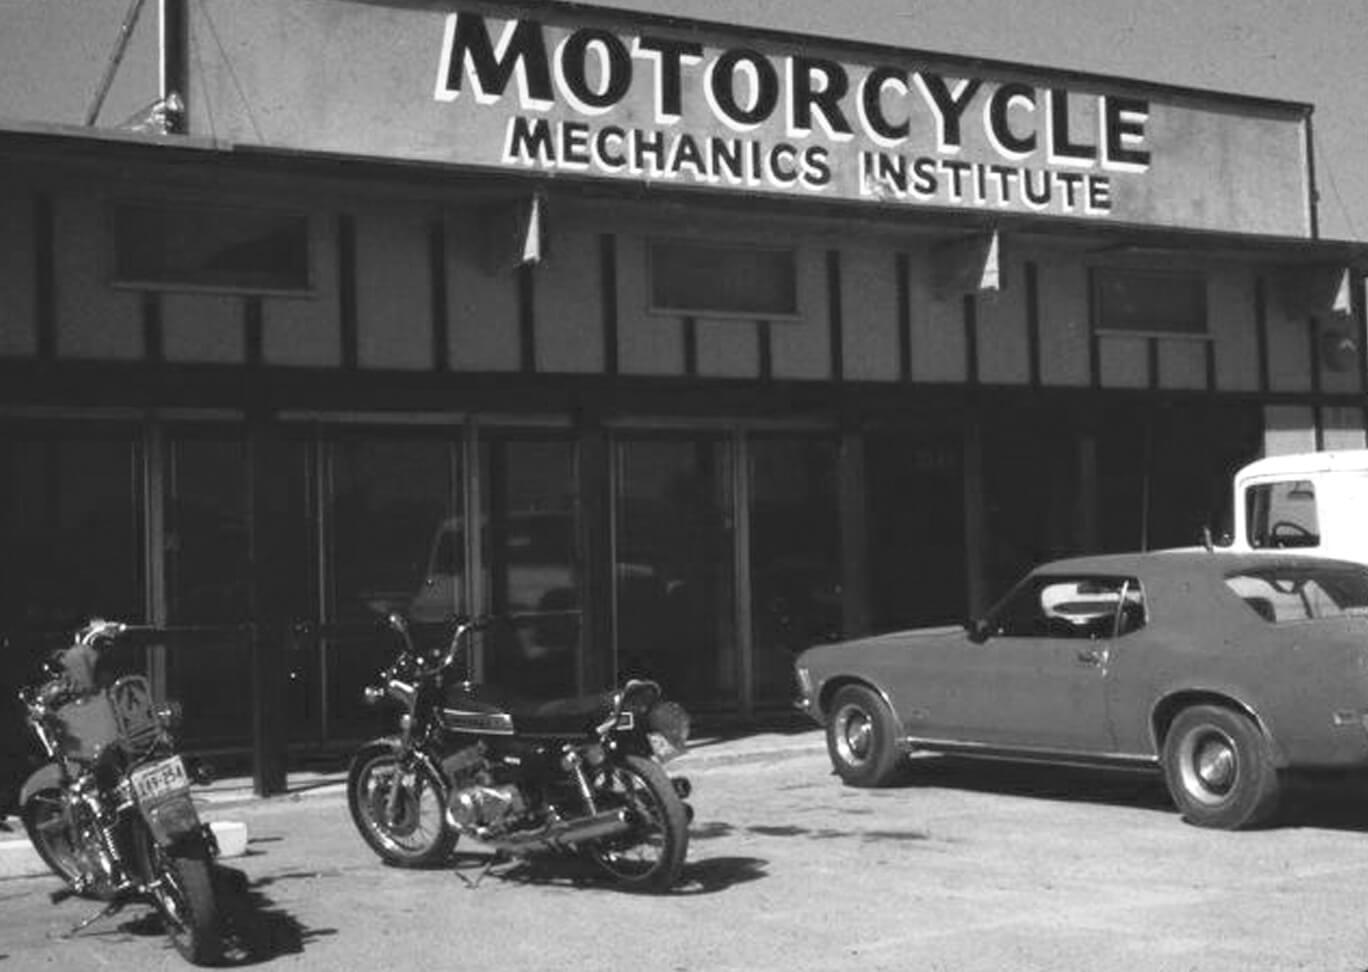 Old black and white exterior photo of the Motorcycle Mechanics Institute in Phoenix Arizona